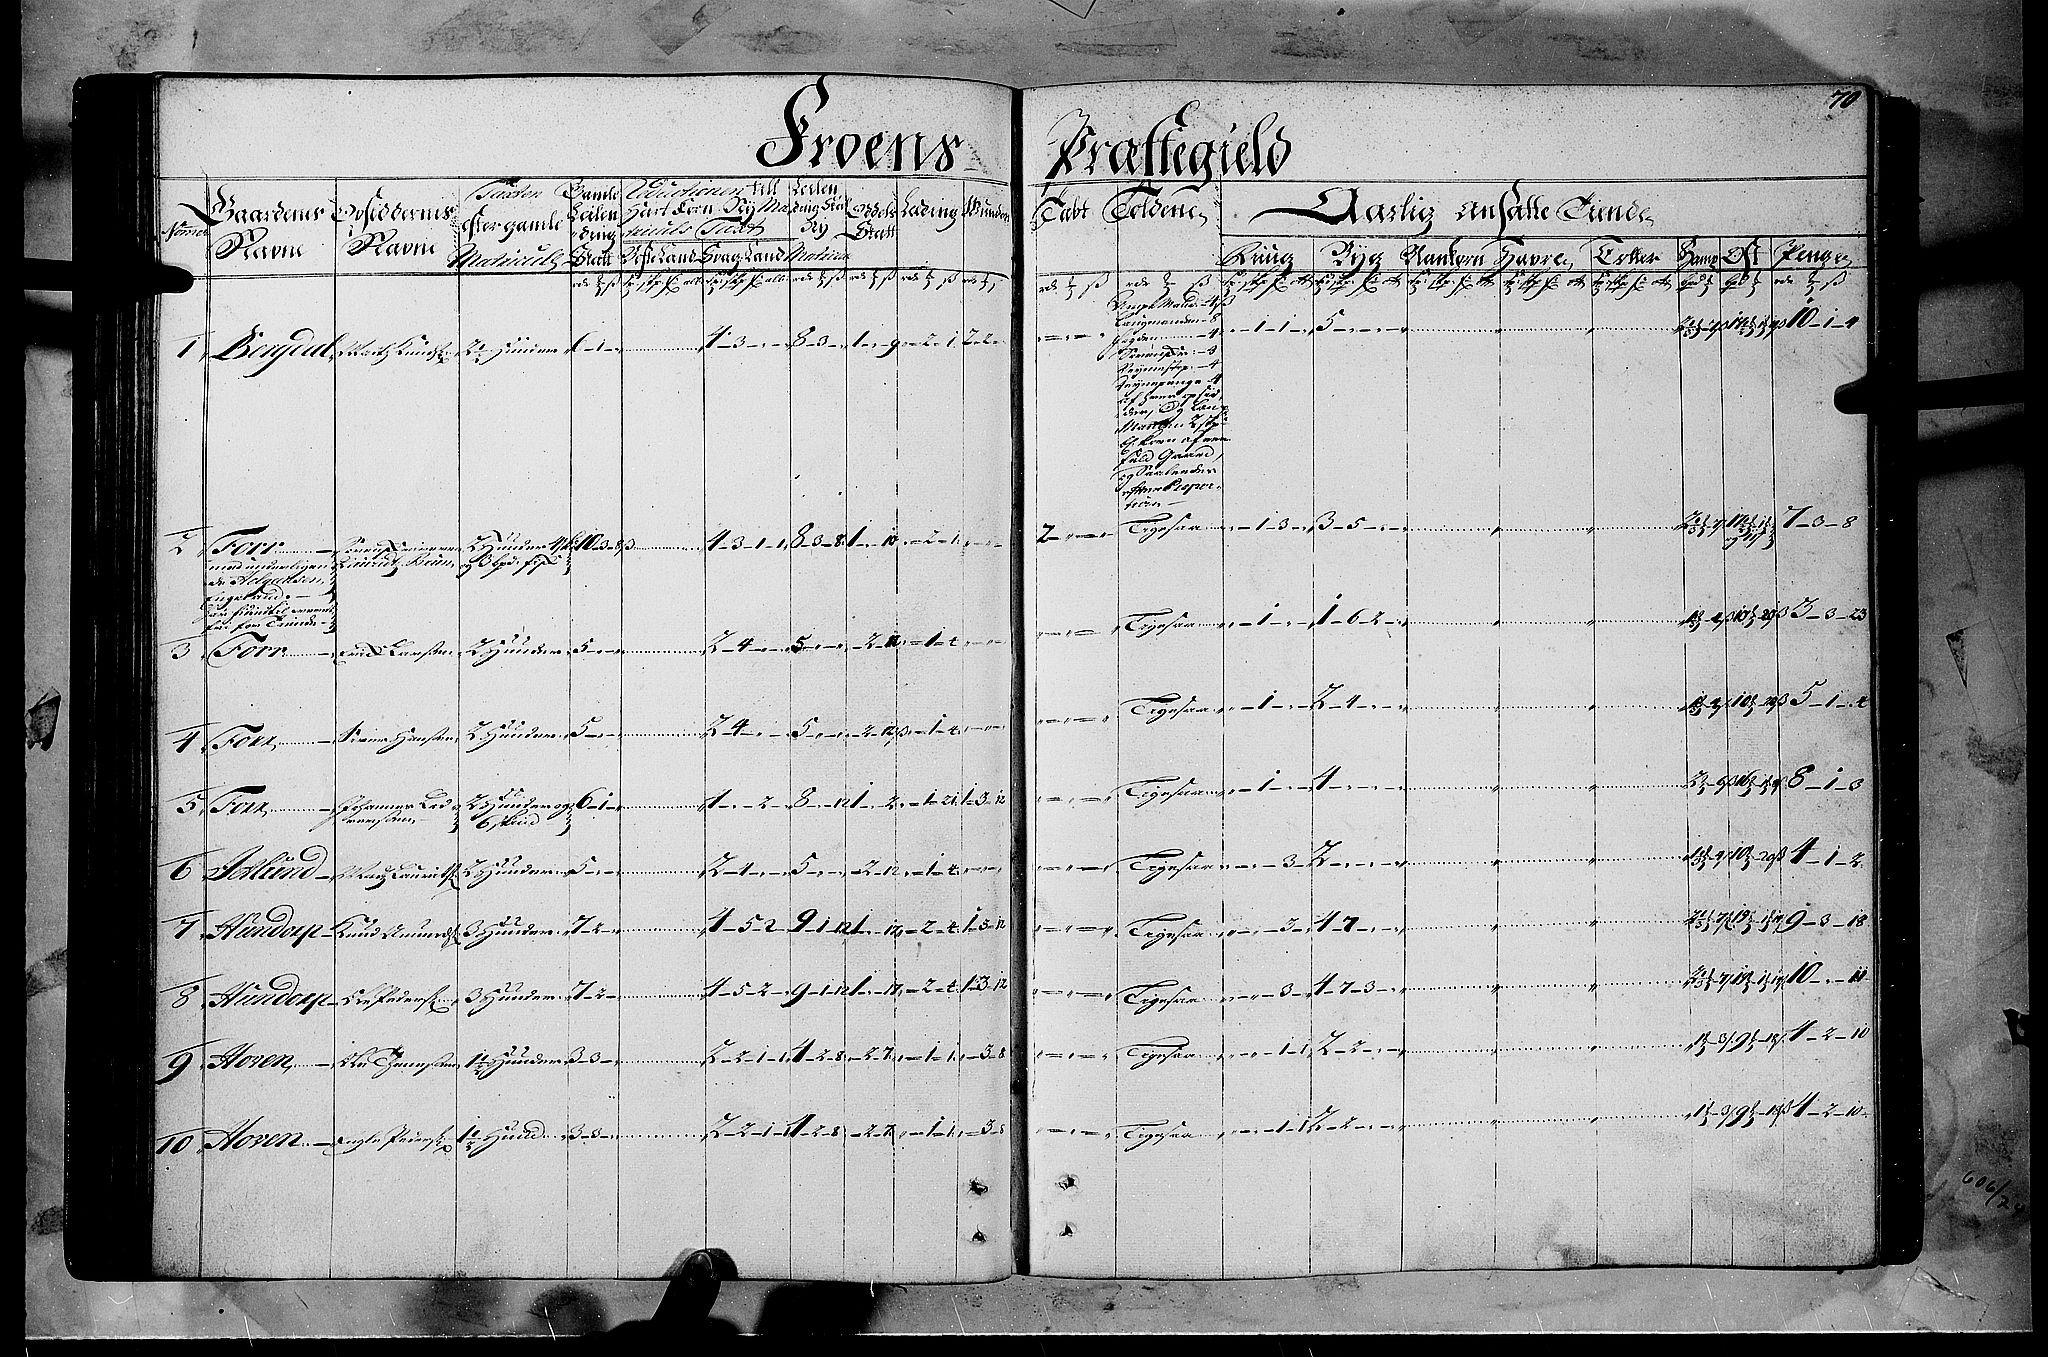 RA, Rentekammeret inntil 1814, Realistisk ordnet avdeling, N/Nb/Nbf/L0108: Gudbrandsdalen matrikkelprotokoll, 1723, s. 69b-70a